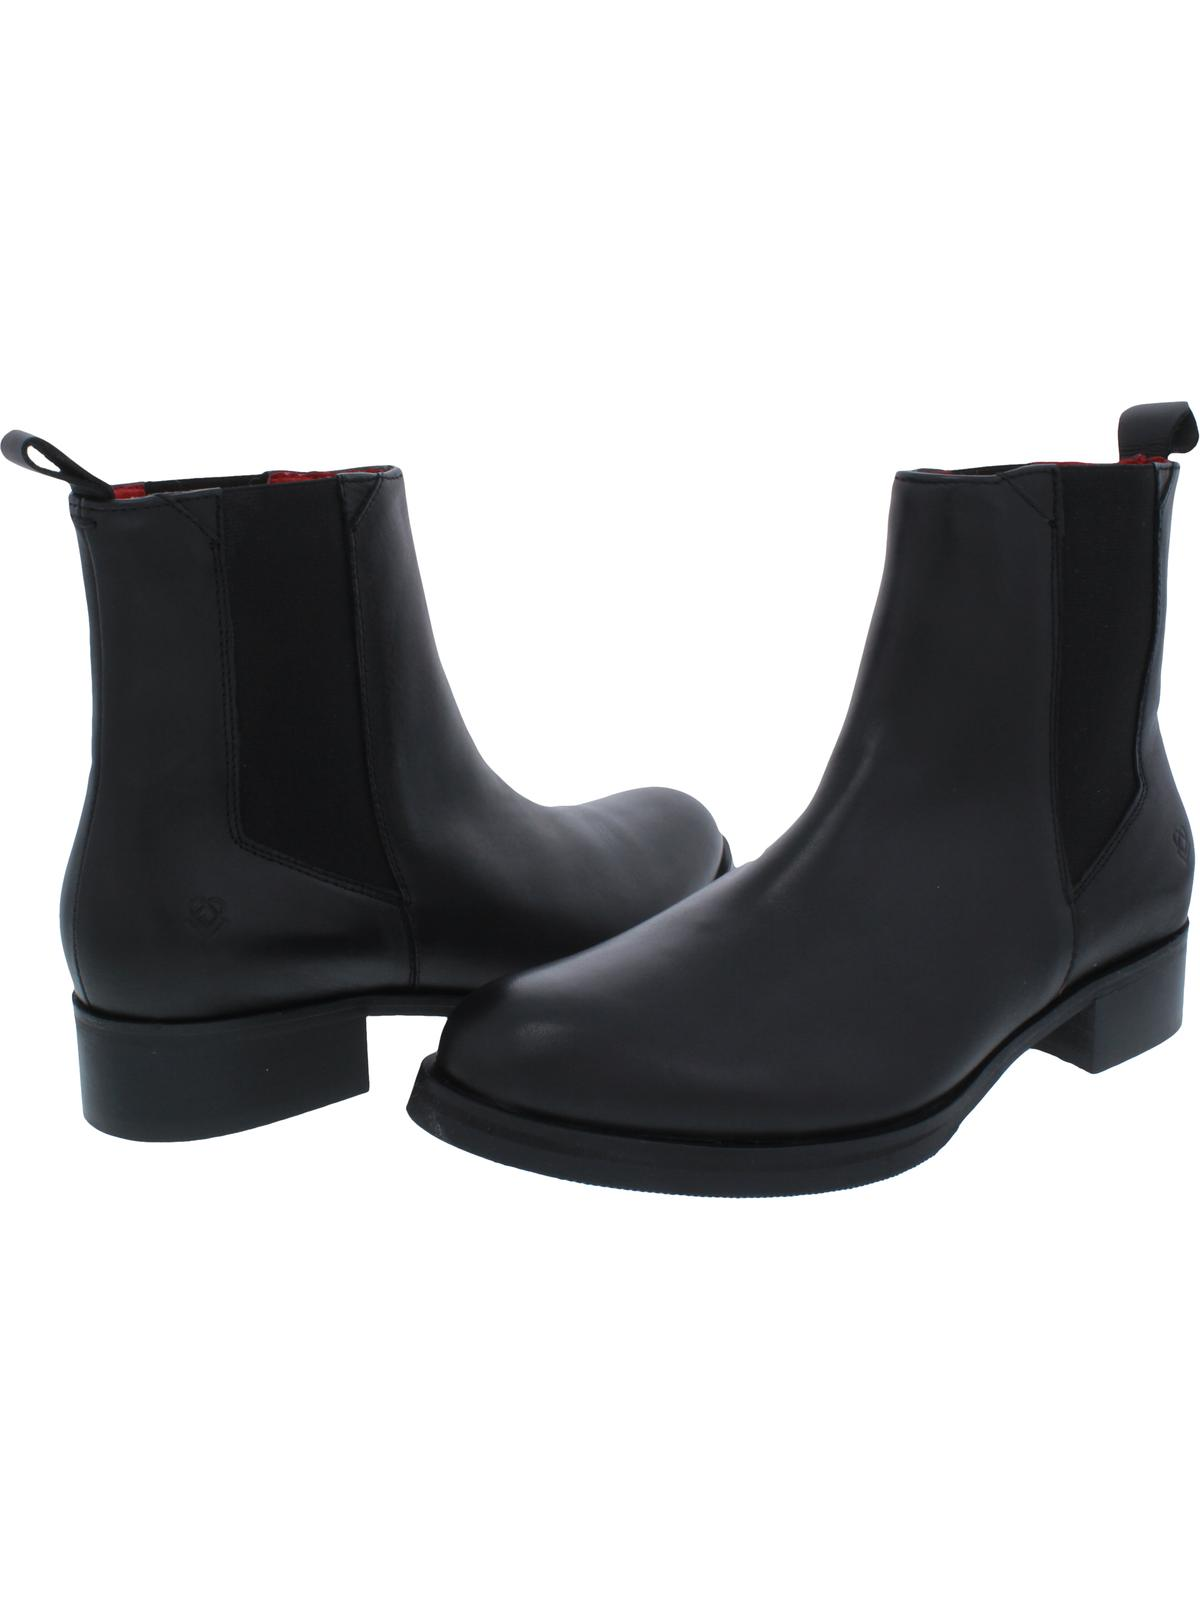 Liebeskind Berlin Womens Round Toe Ankle Chelsea Boots Black 37 Medium (B,M)